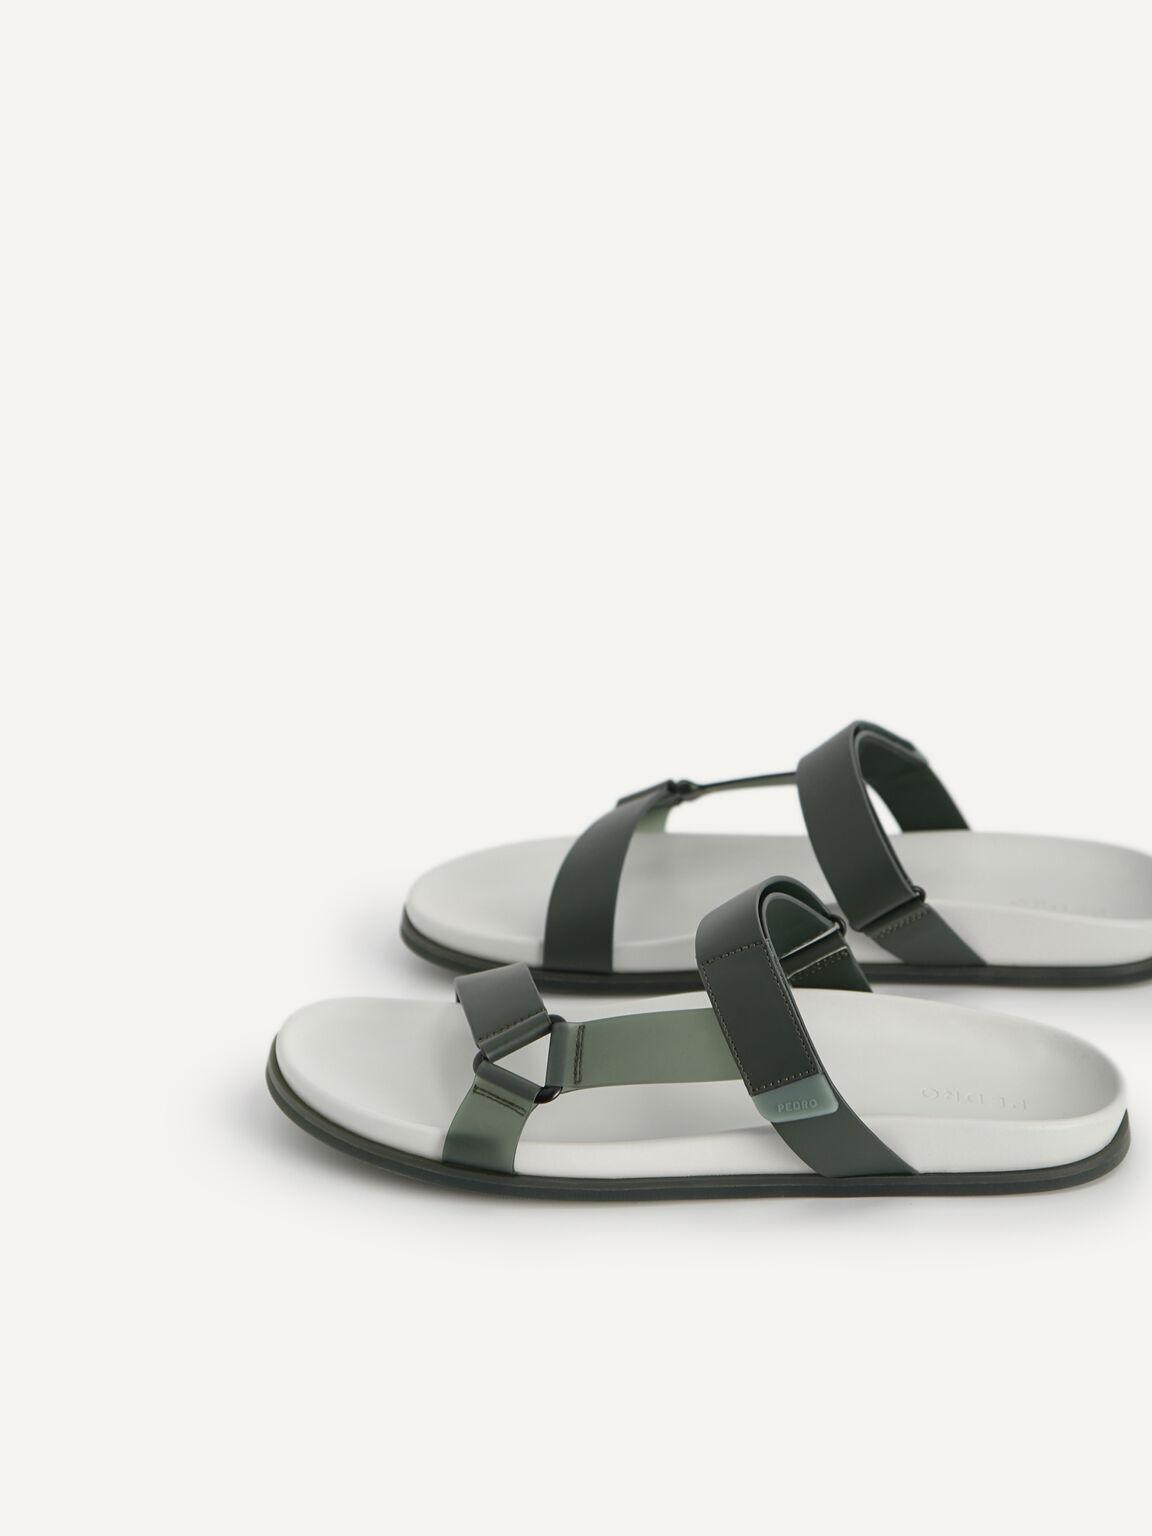 Velcro Strap Sandals, Military Green, hi-res